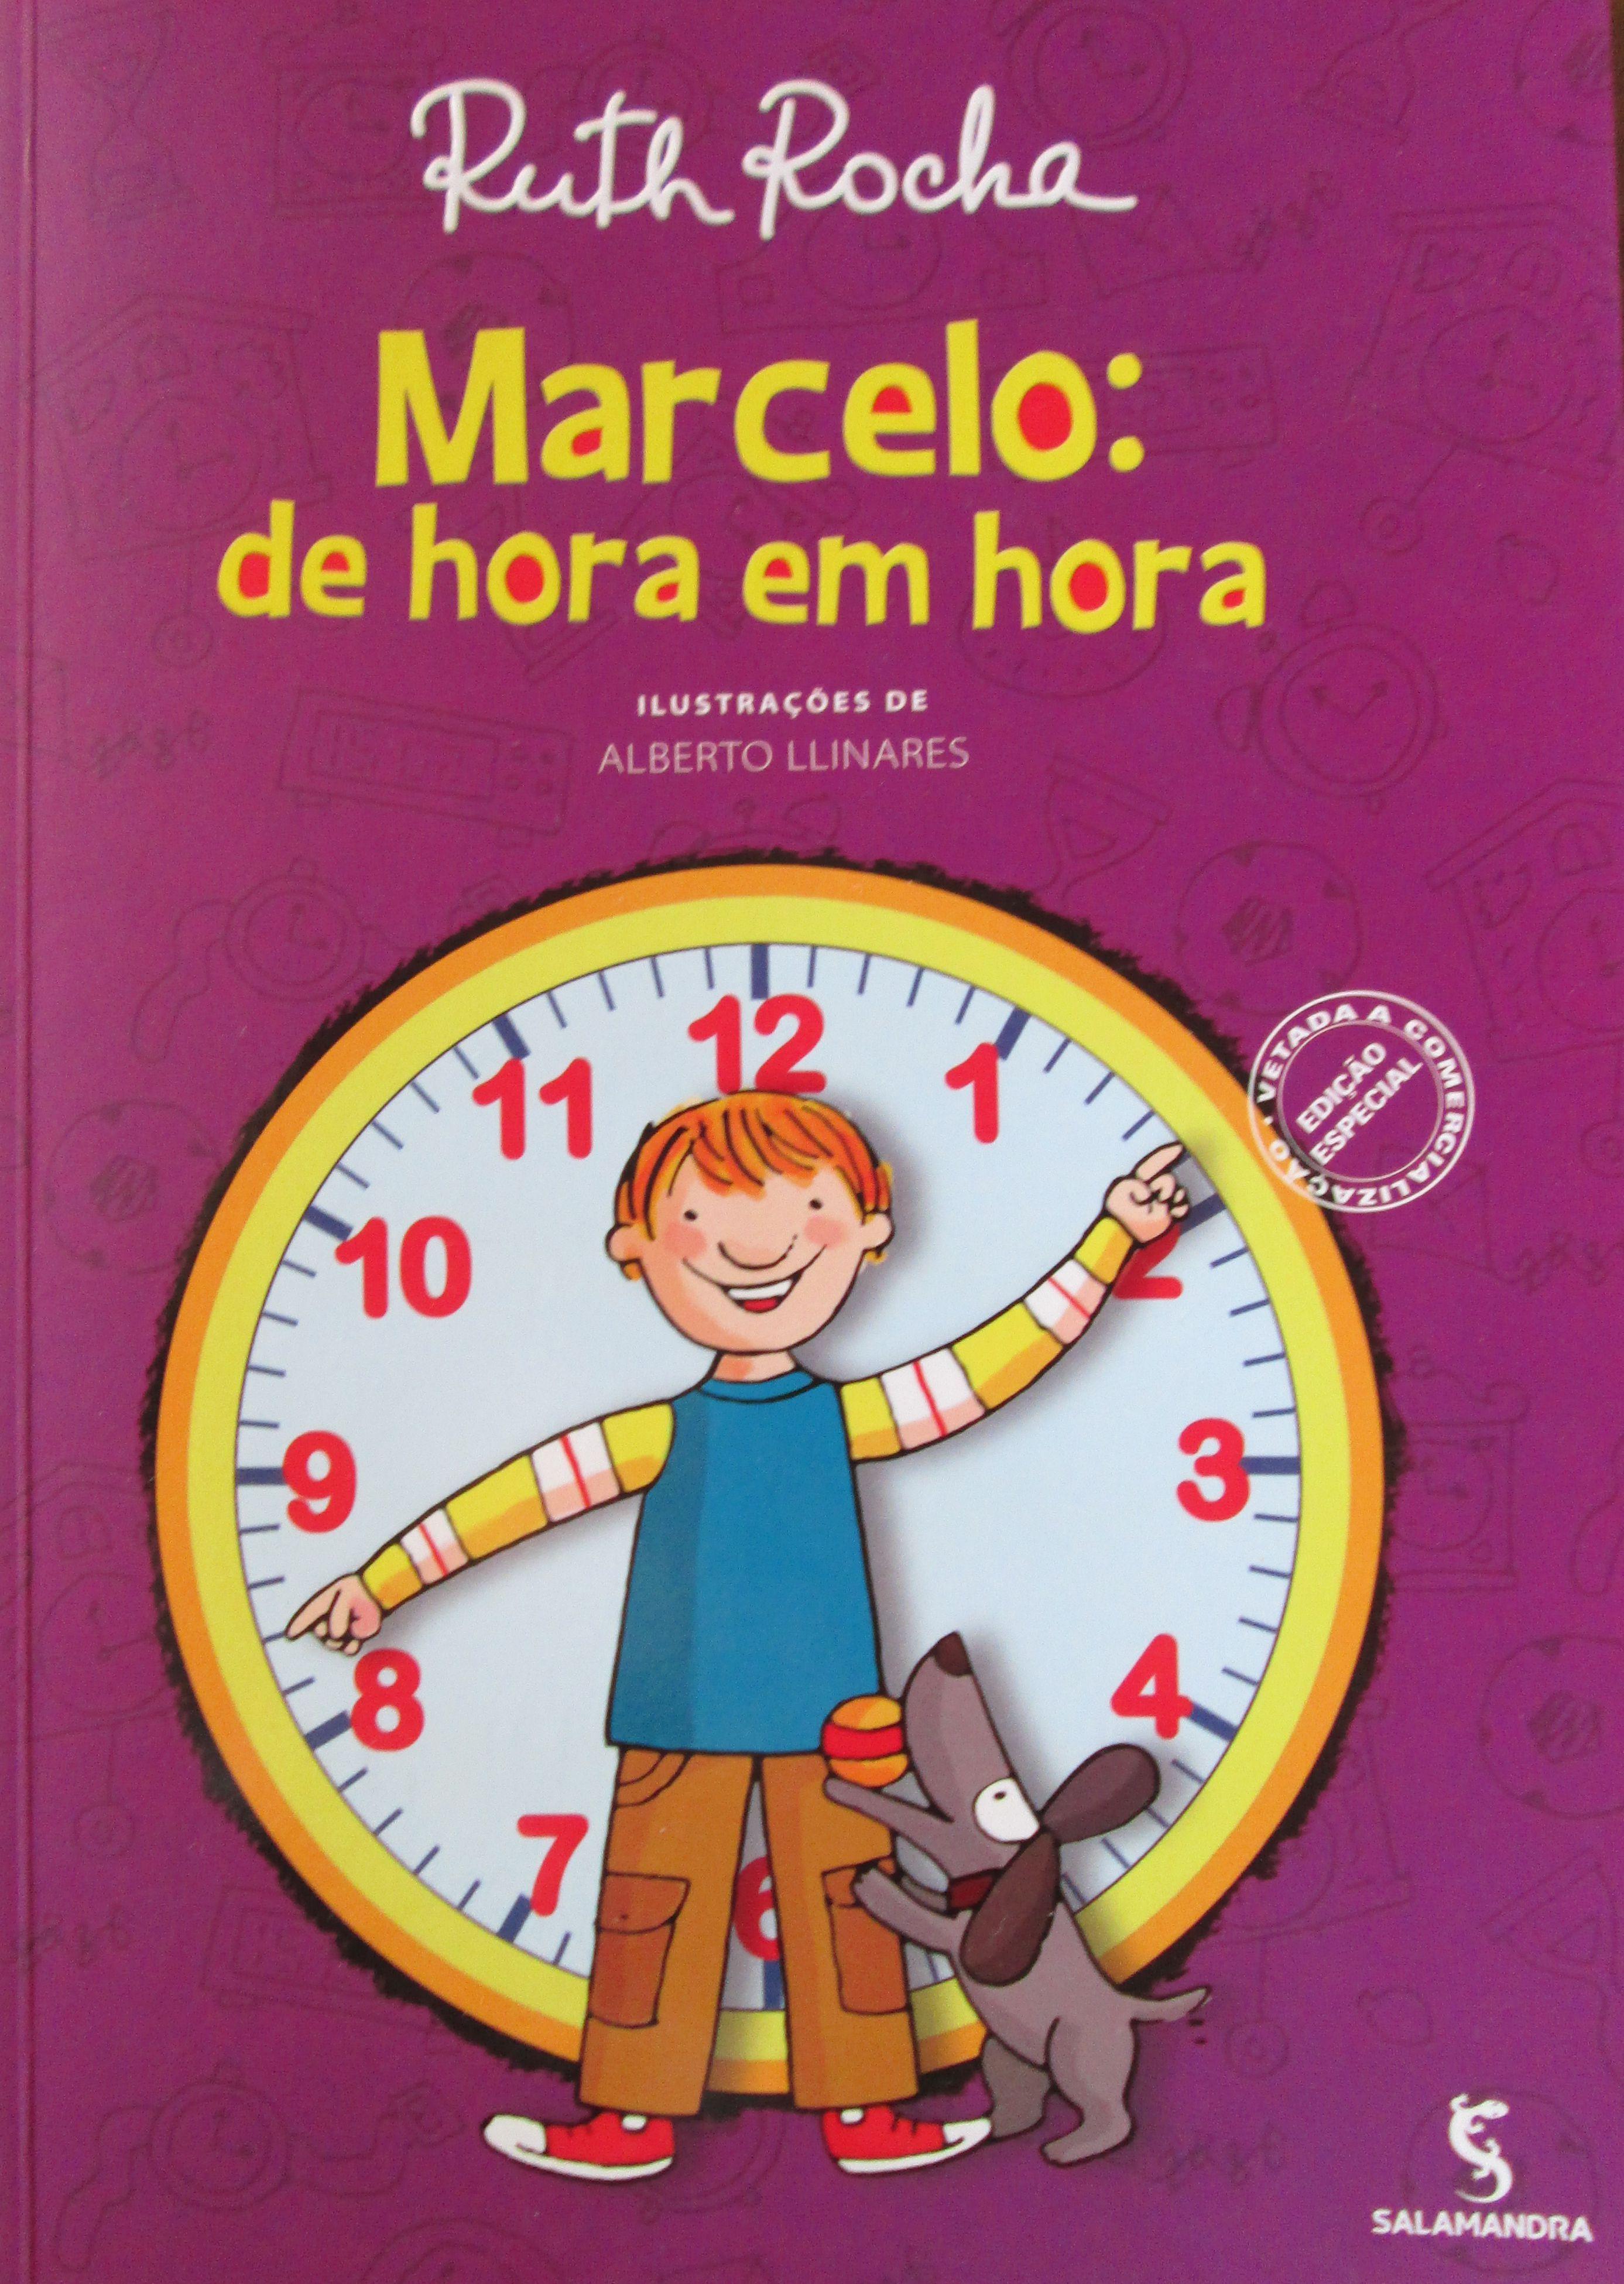 Marcelo marmelo martelo online dating